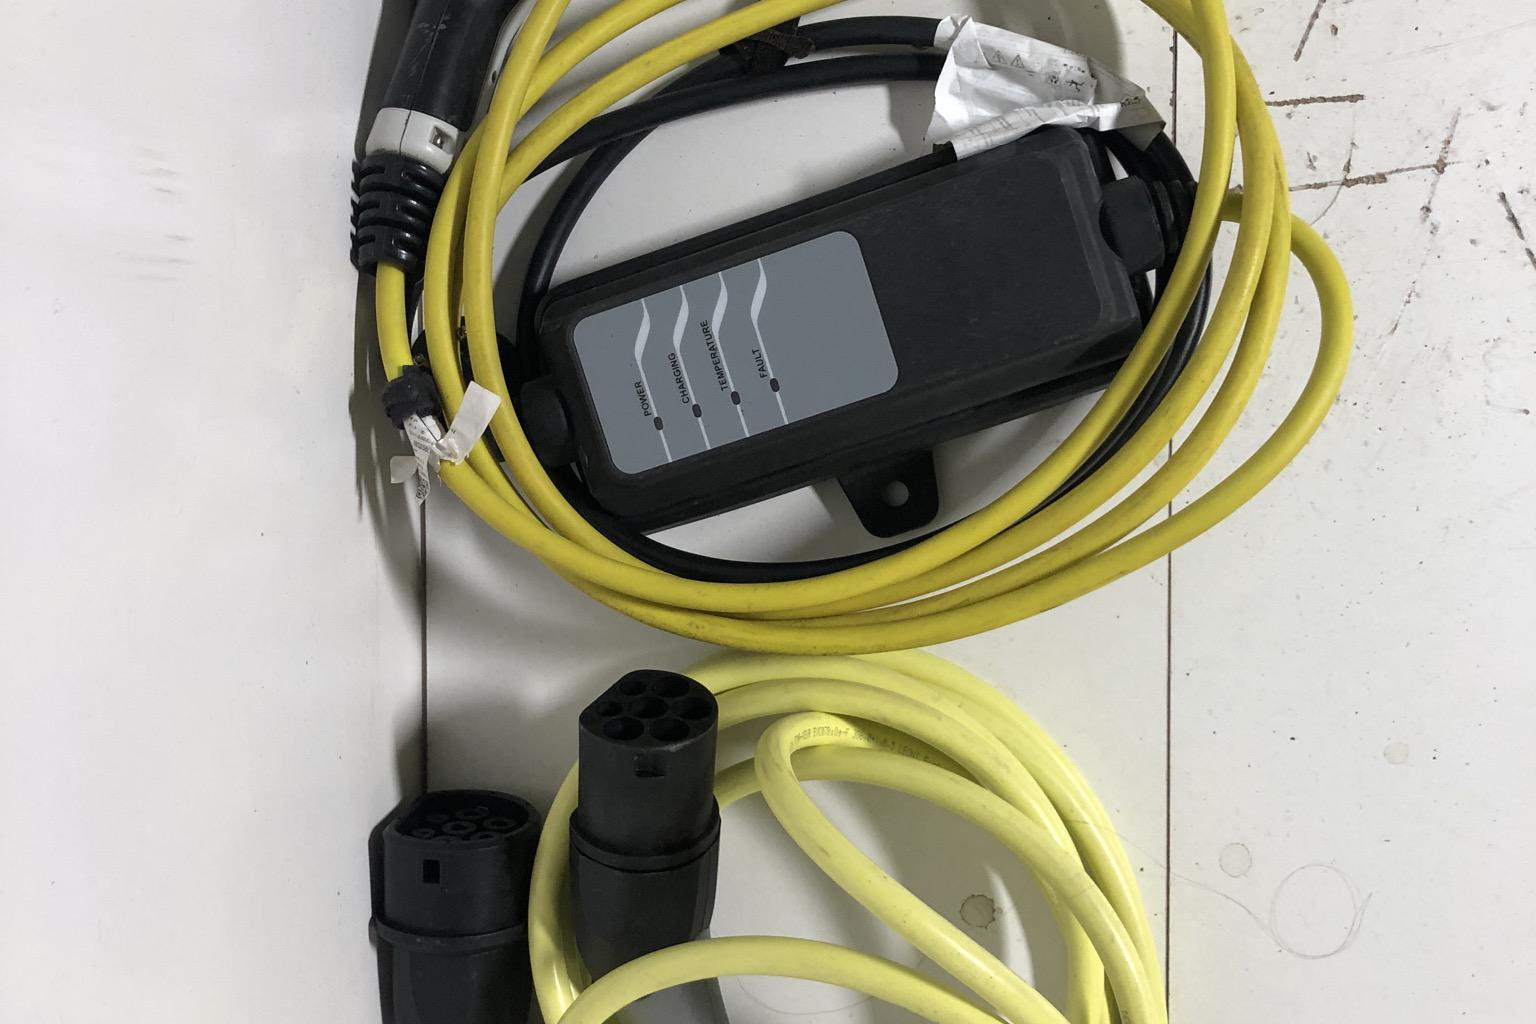 MINI Cooper S E ALL4 Countryman, F60 (224hk) - 5 940 mil - Automat - svart - 2019